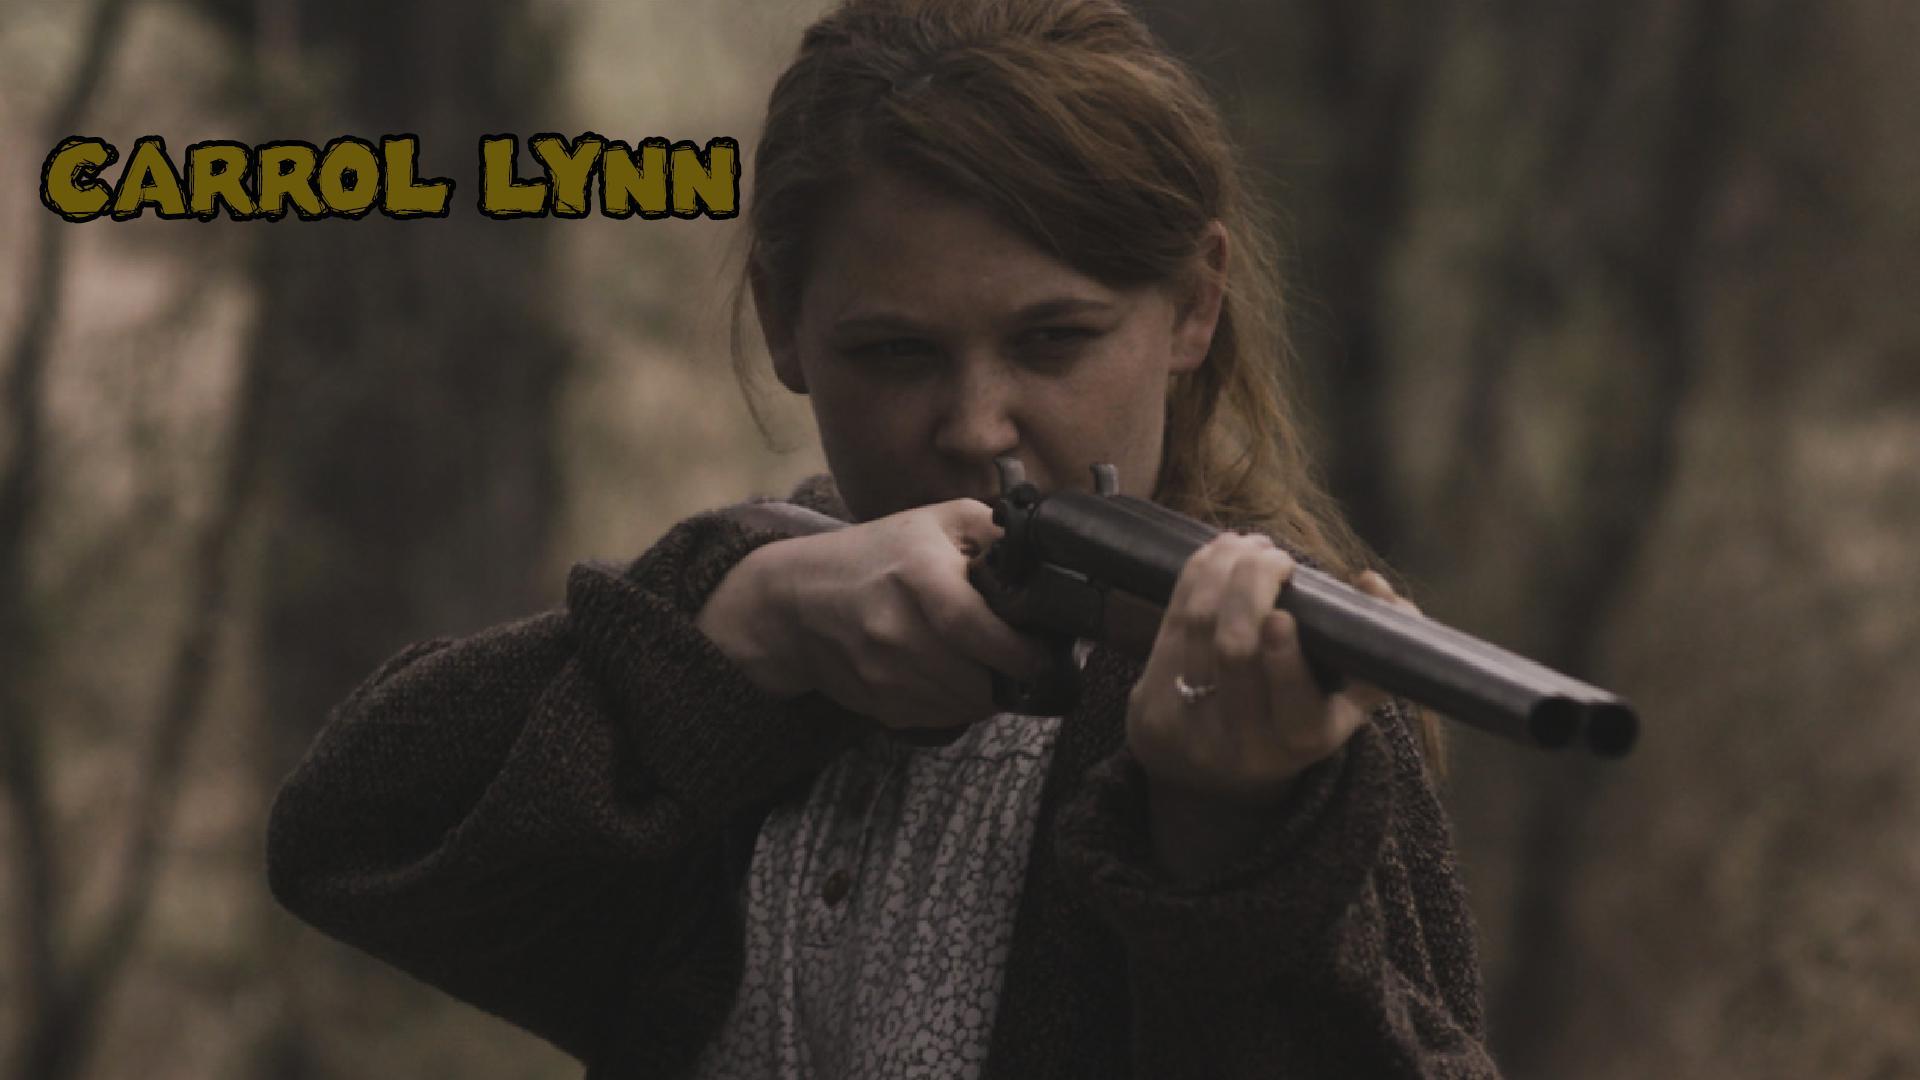 Carrol Lynn